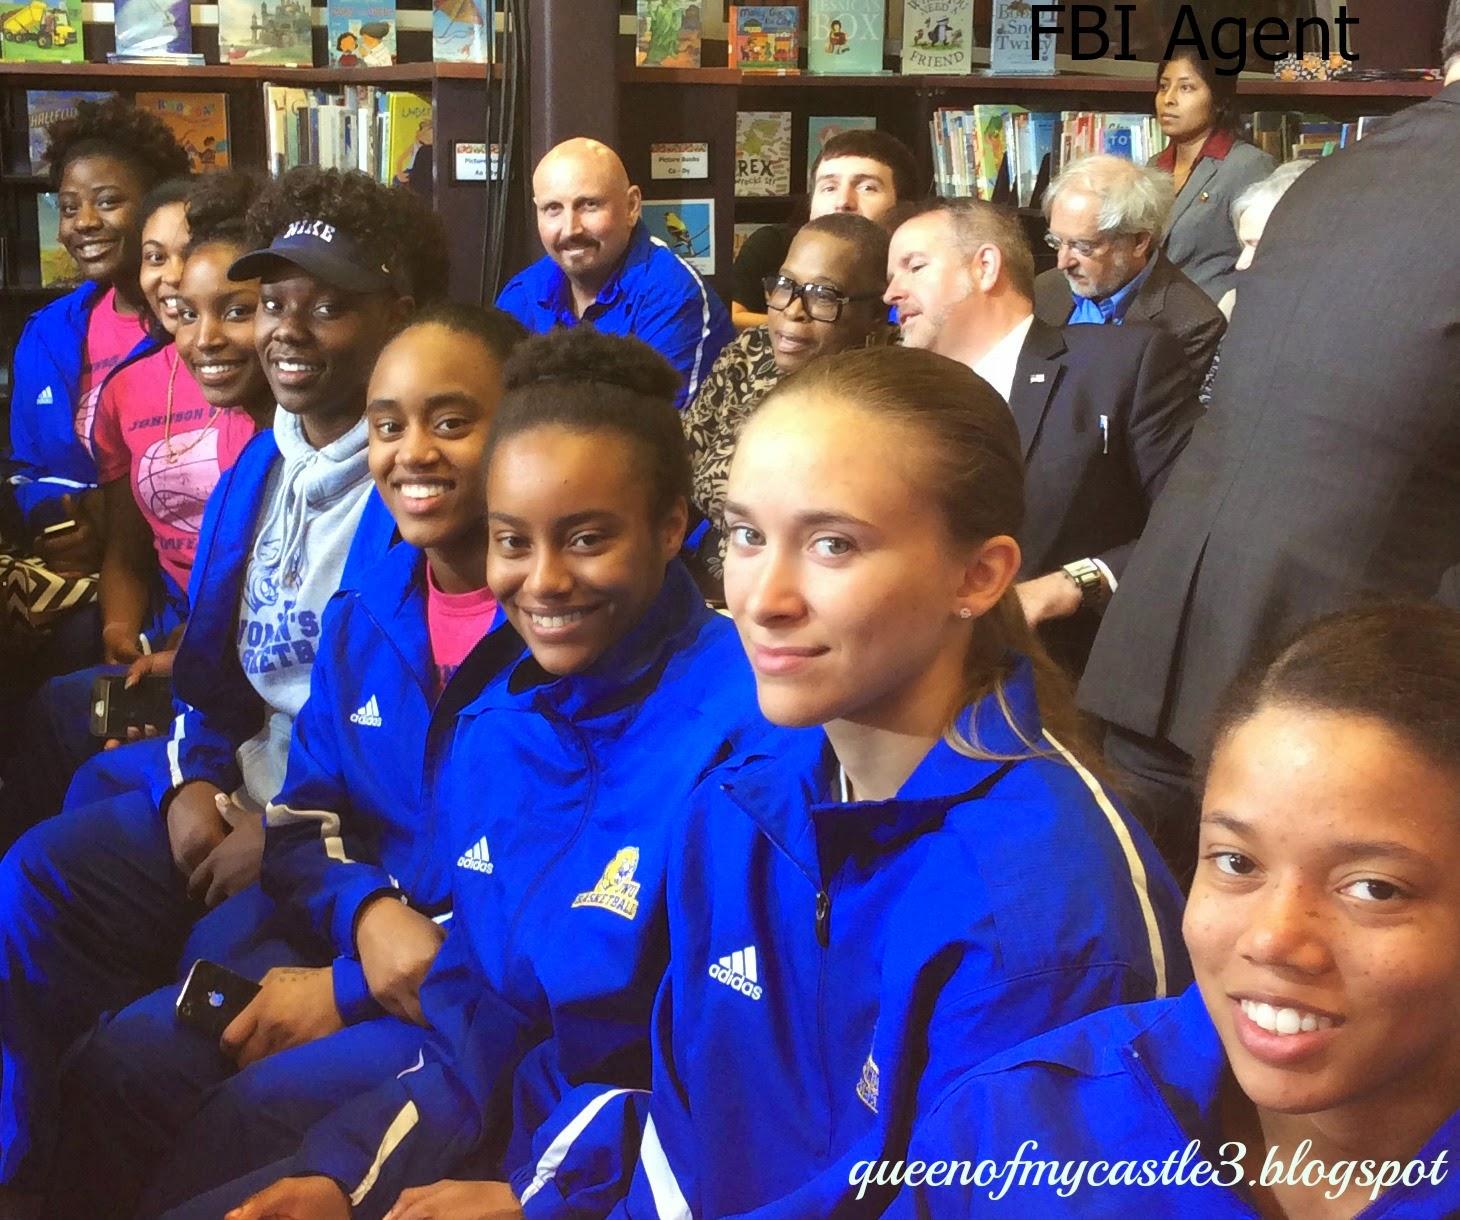 Johnson & Wales Woman's Basketball Team